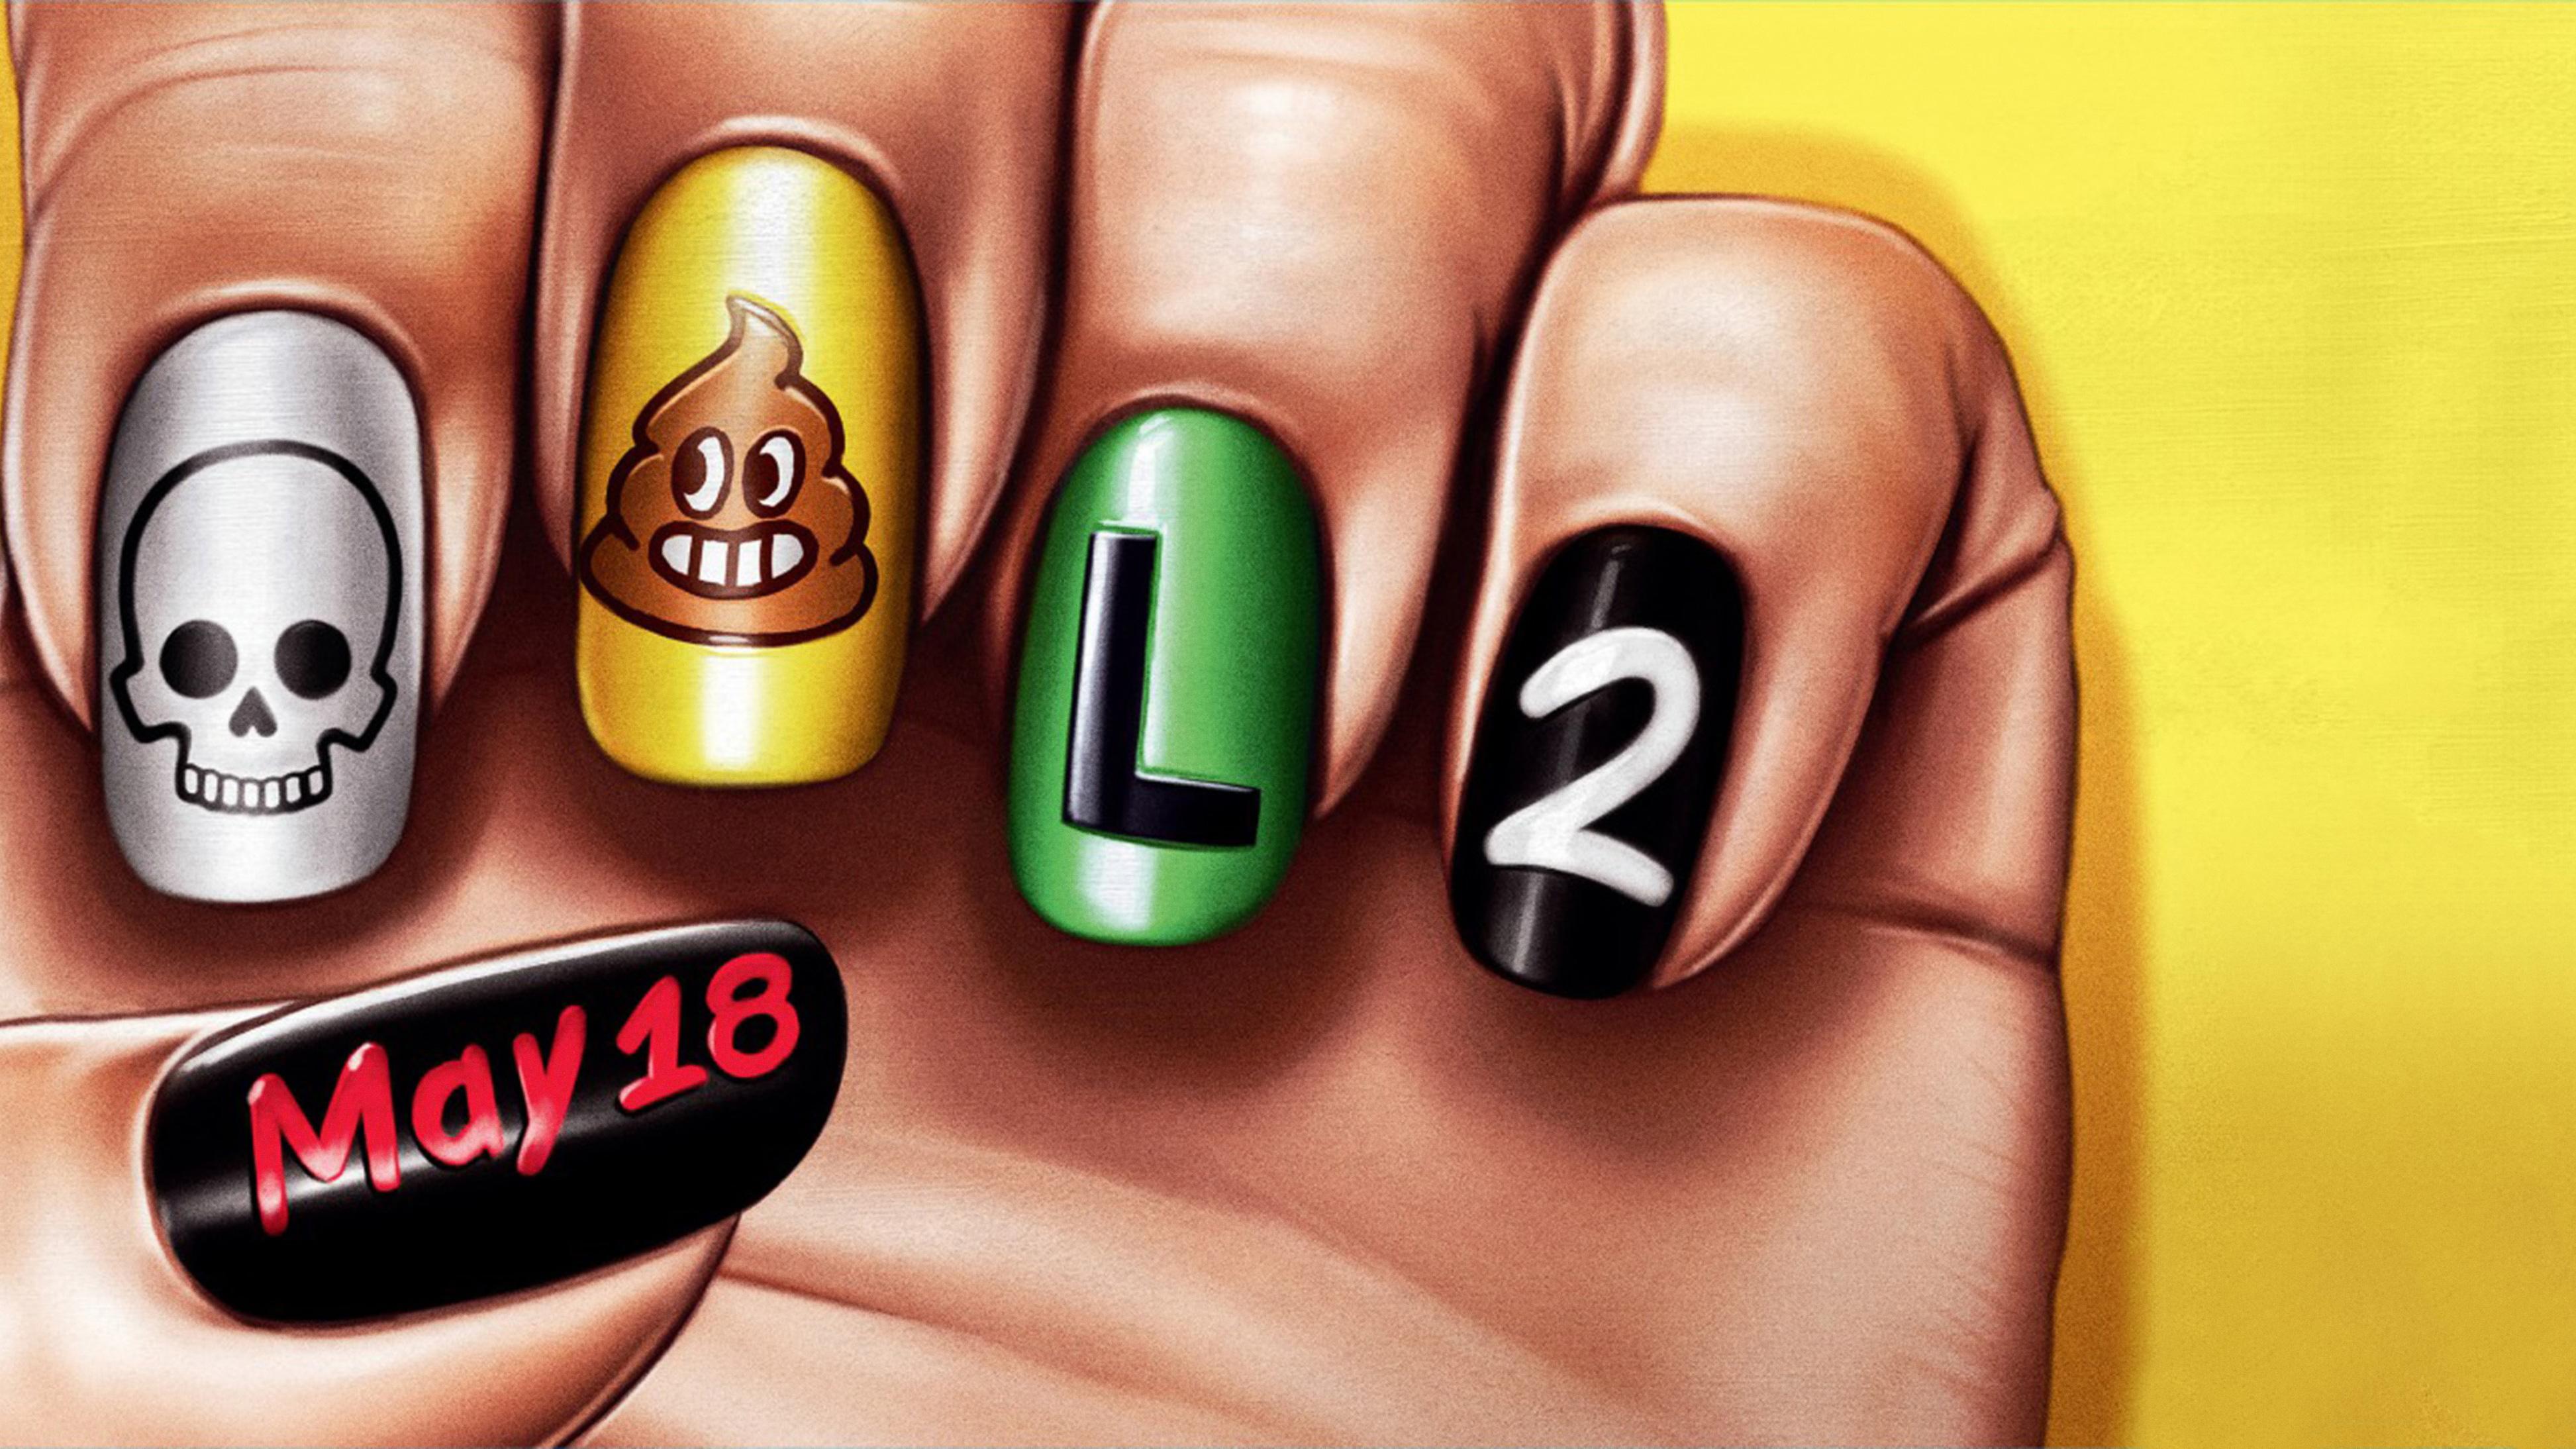 4k Deadpool 2 Funny Nail Arts Poster, HD Movies, 4k Wallpapers ...